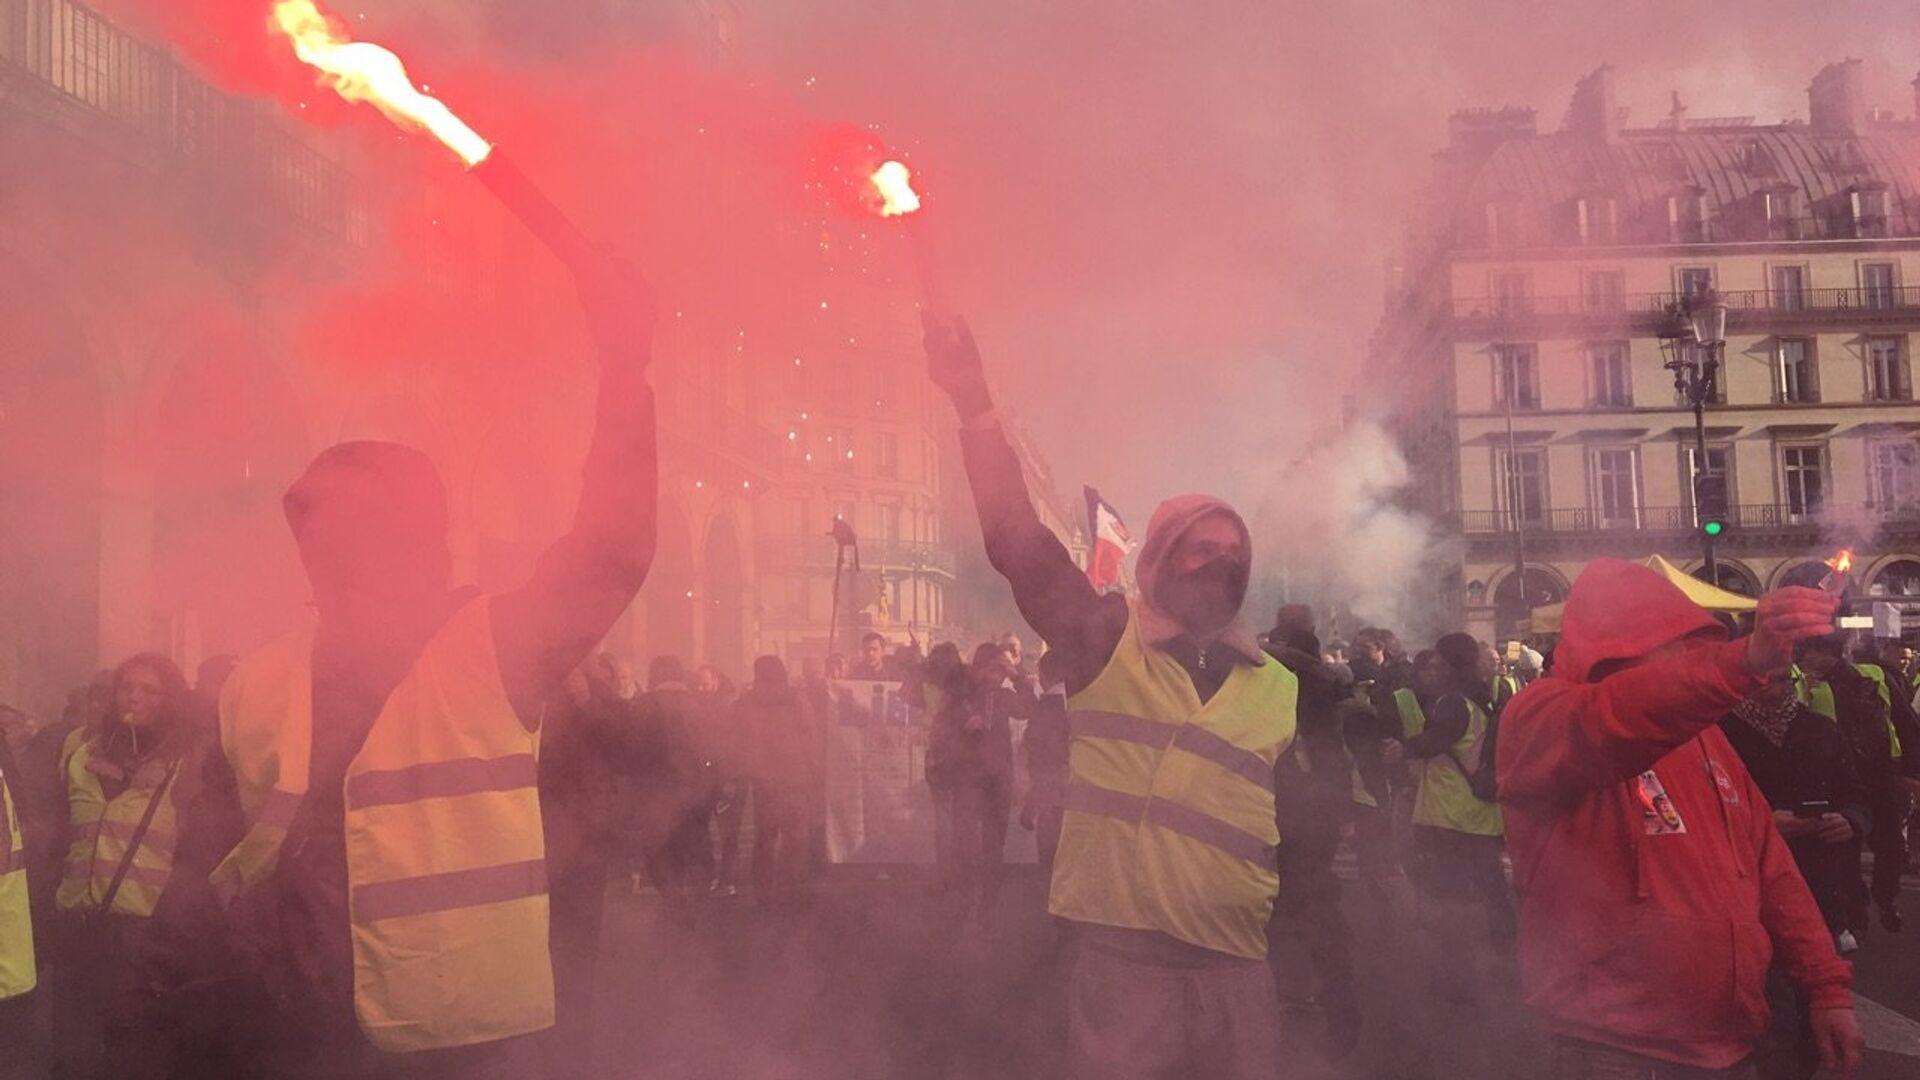 Le proteste dei sindacati francesi per i salari minimi nel Paese - Sputnik Italia, 1920, 02.07.2021